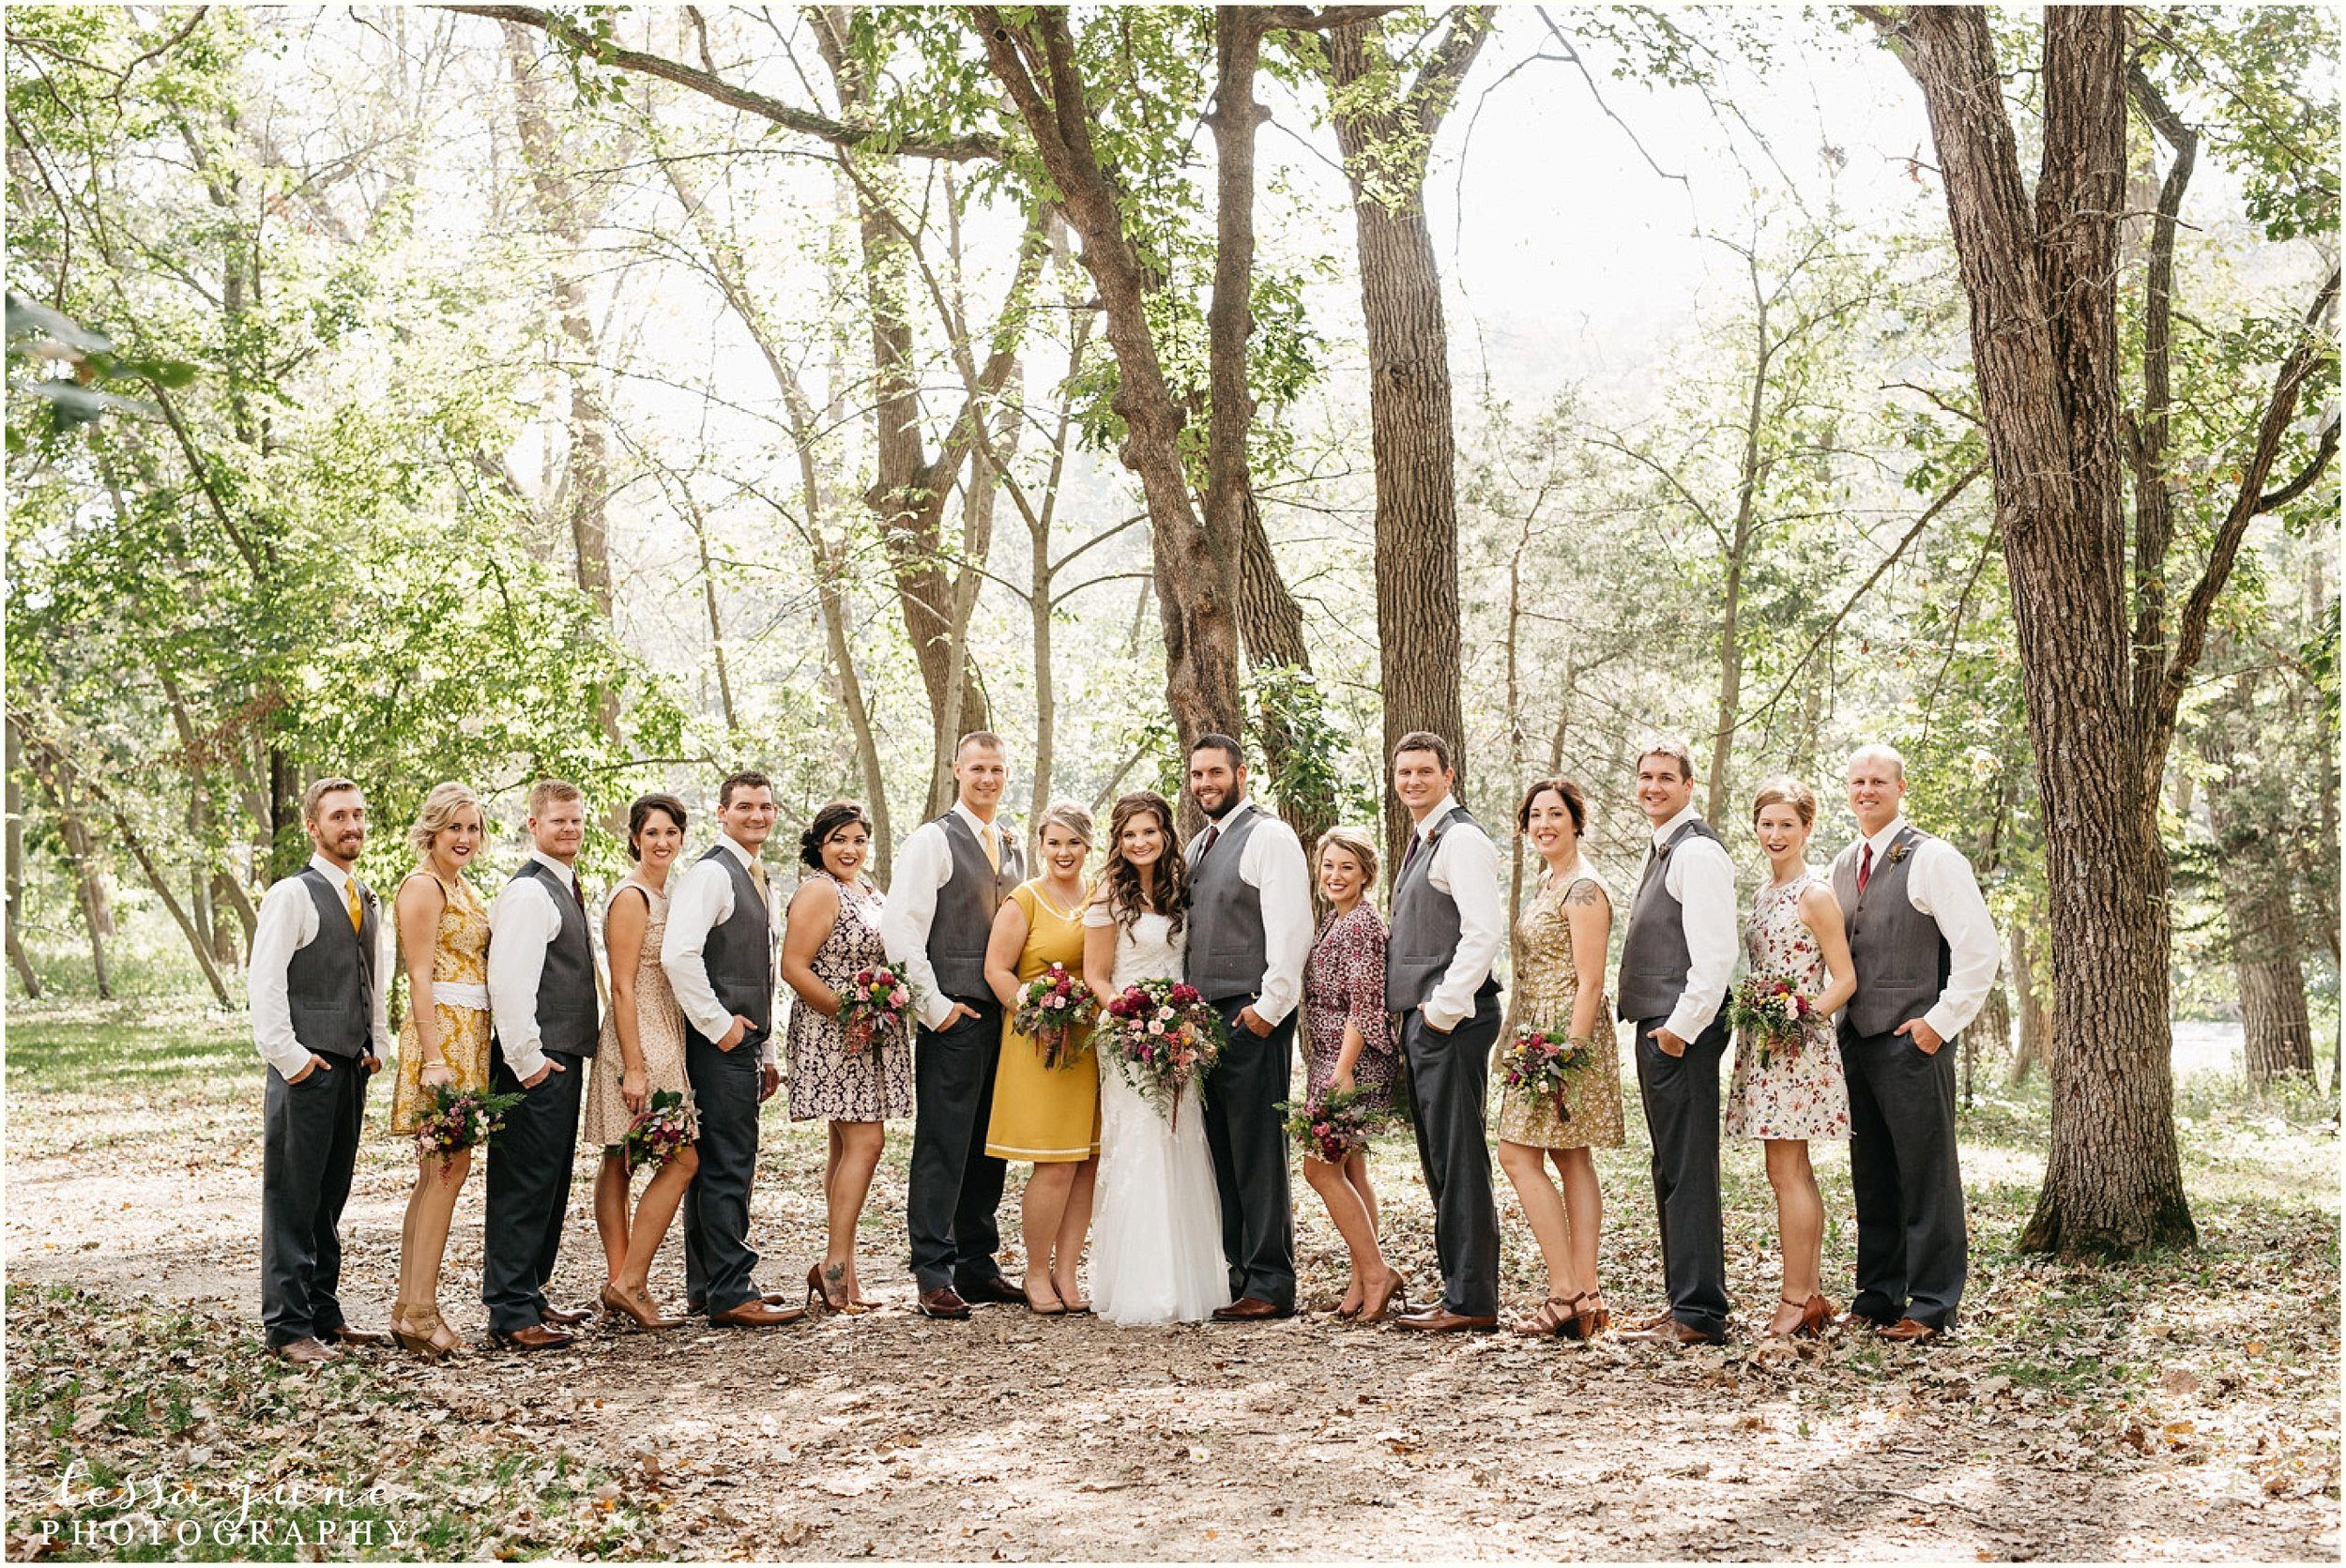 bohemian-minnesota-wedding-mismatched-bridesmaid-dresses-waterfall-st-cloud-tessa-june-photography-89.jpg